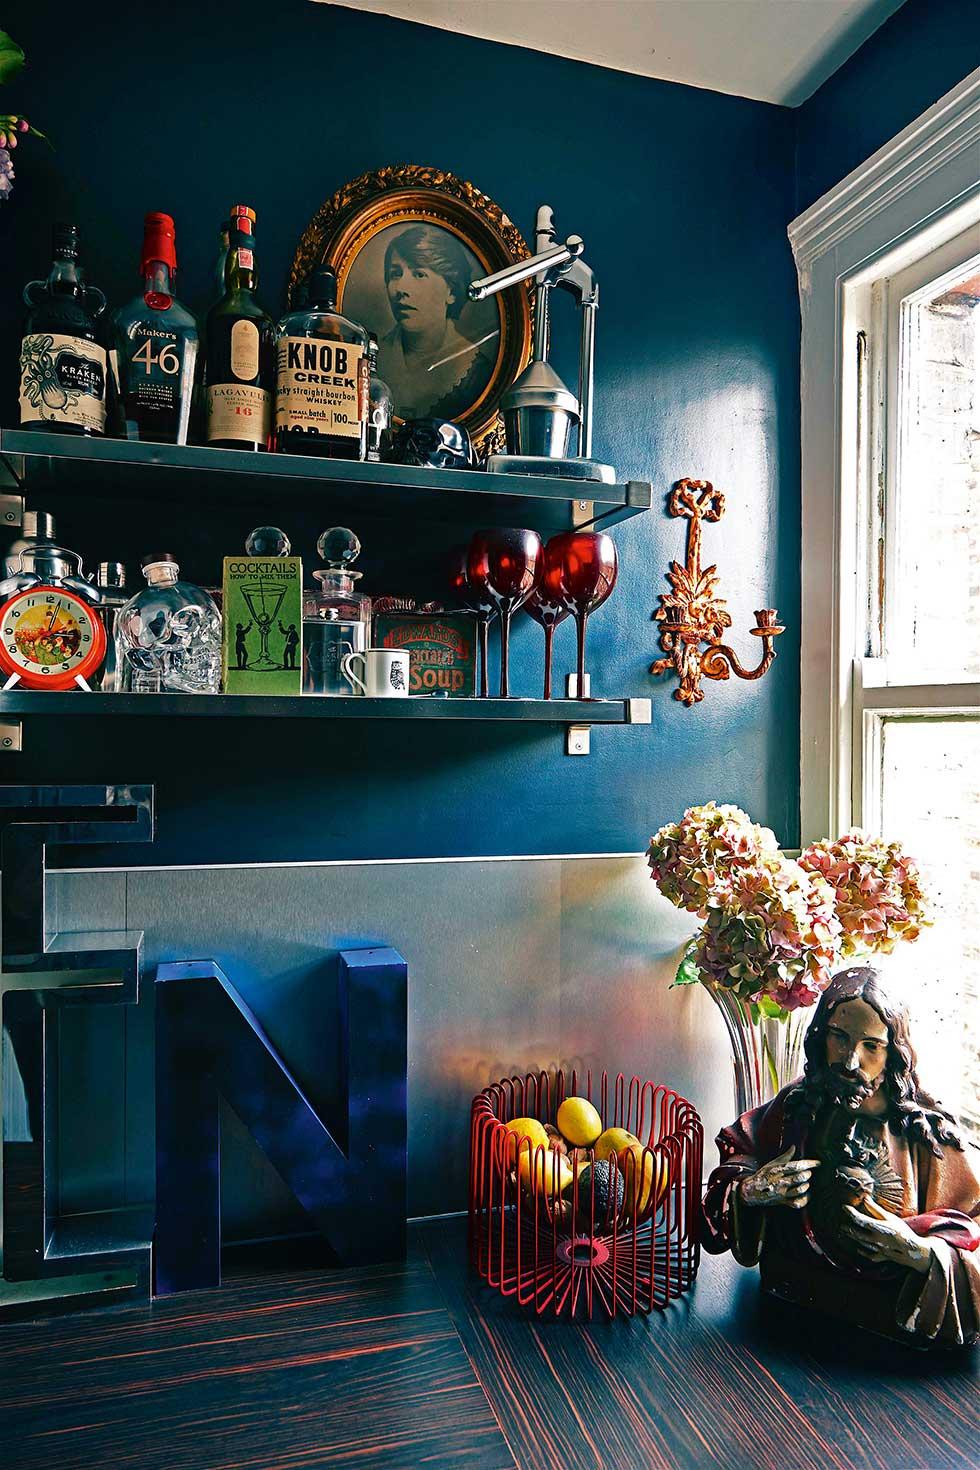 Duplex apartment kitchen shelves and bottles